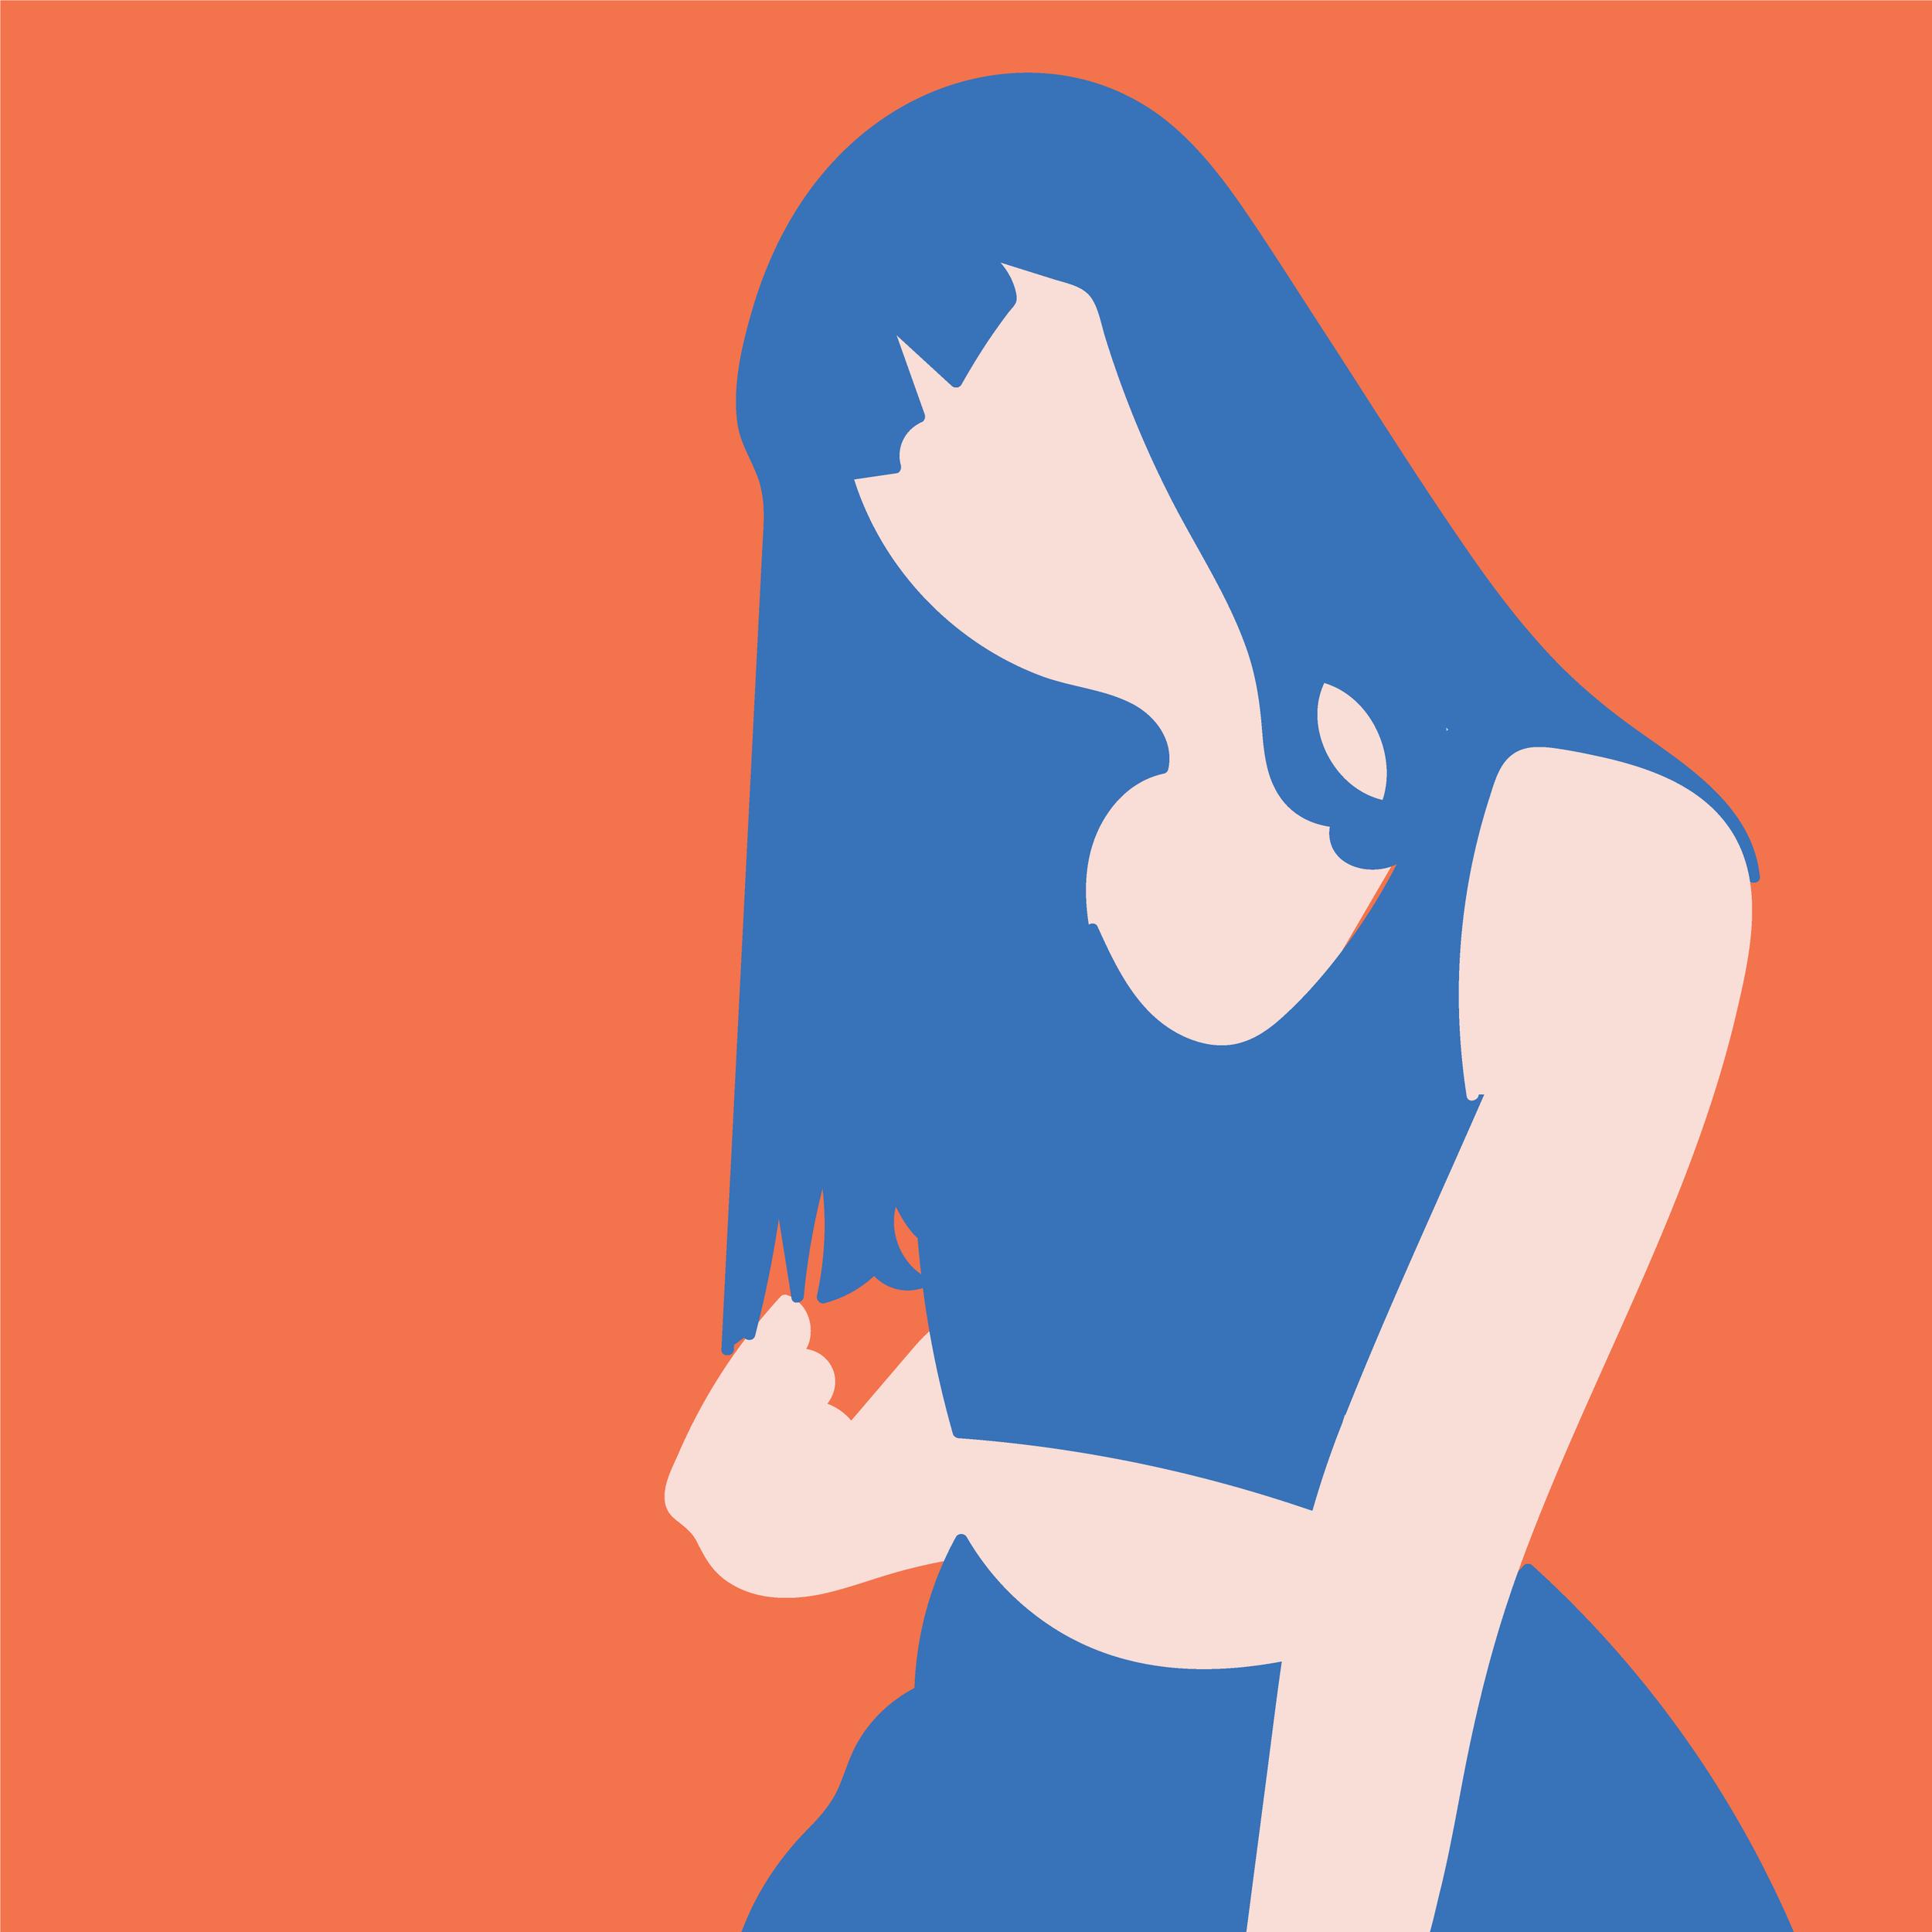 zoeligon-illustrations-eva-mar5-09.png